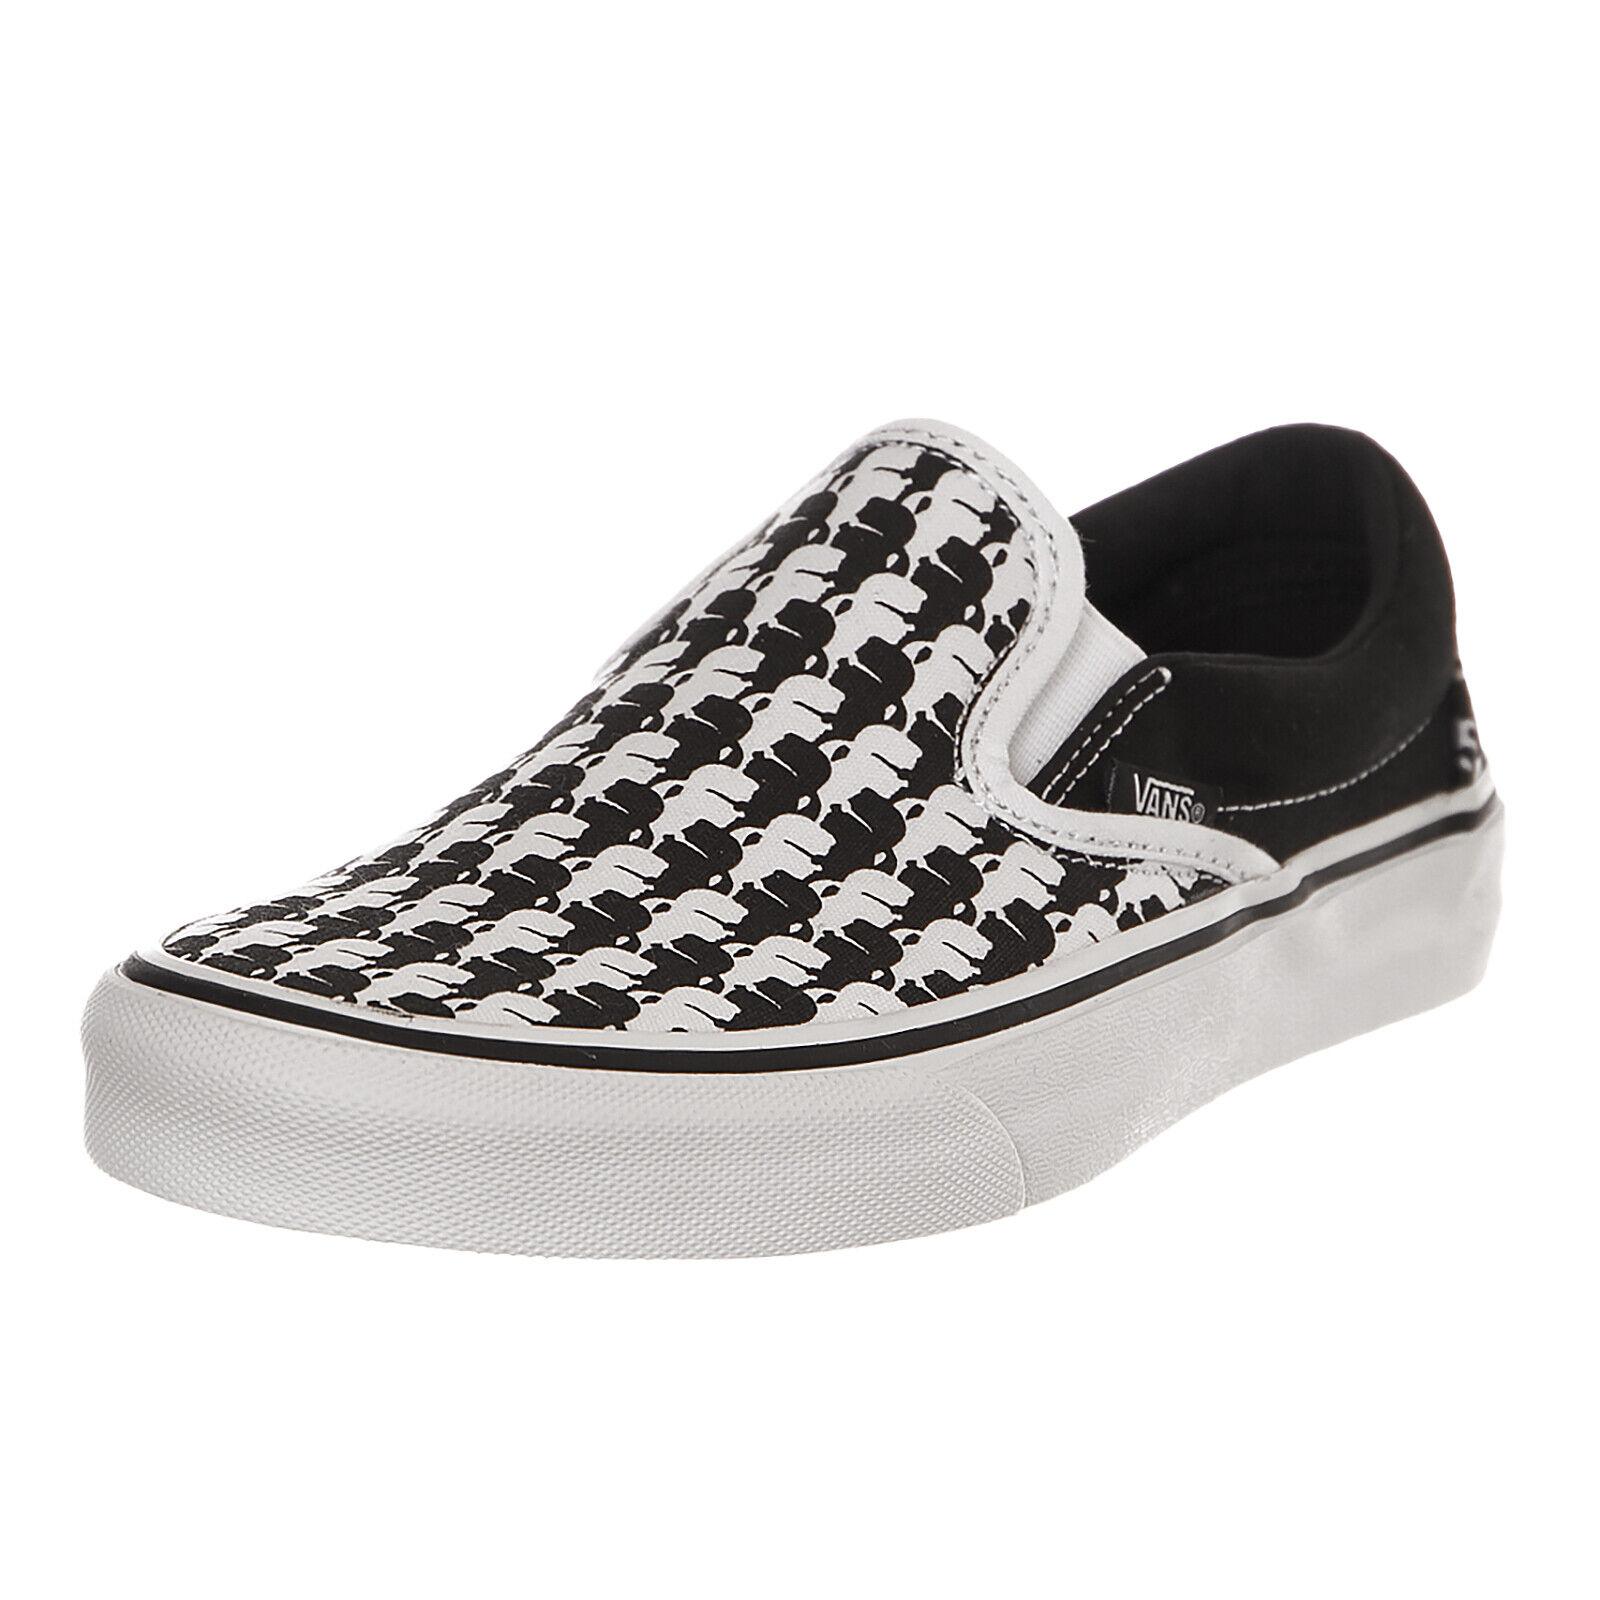 Vans Sneakers UA Classic Slip - On (Karl lagerf multicoloured